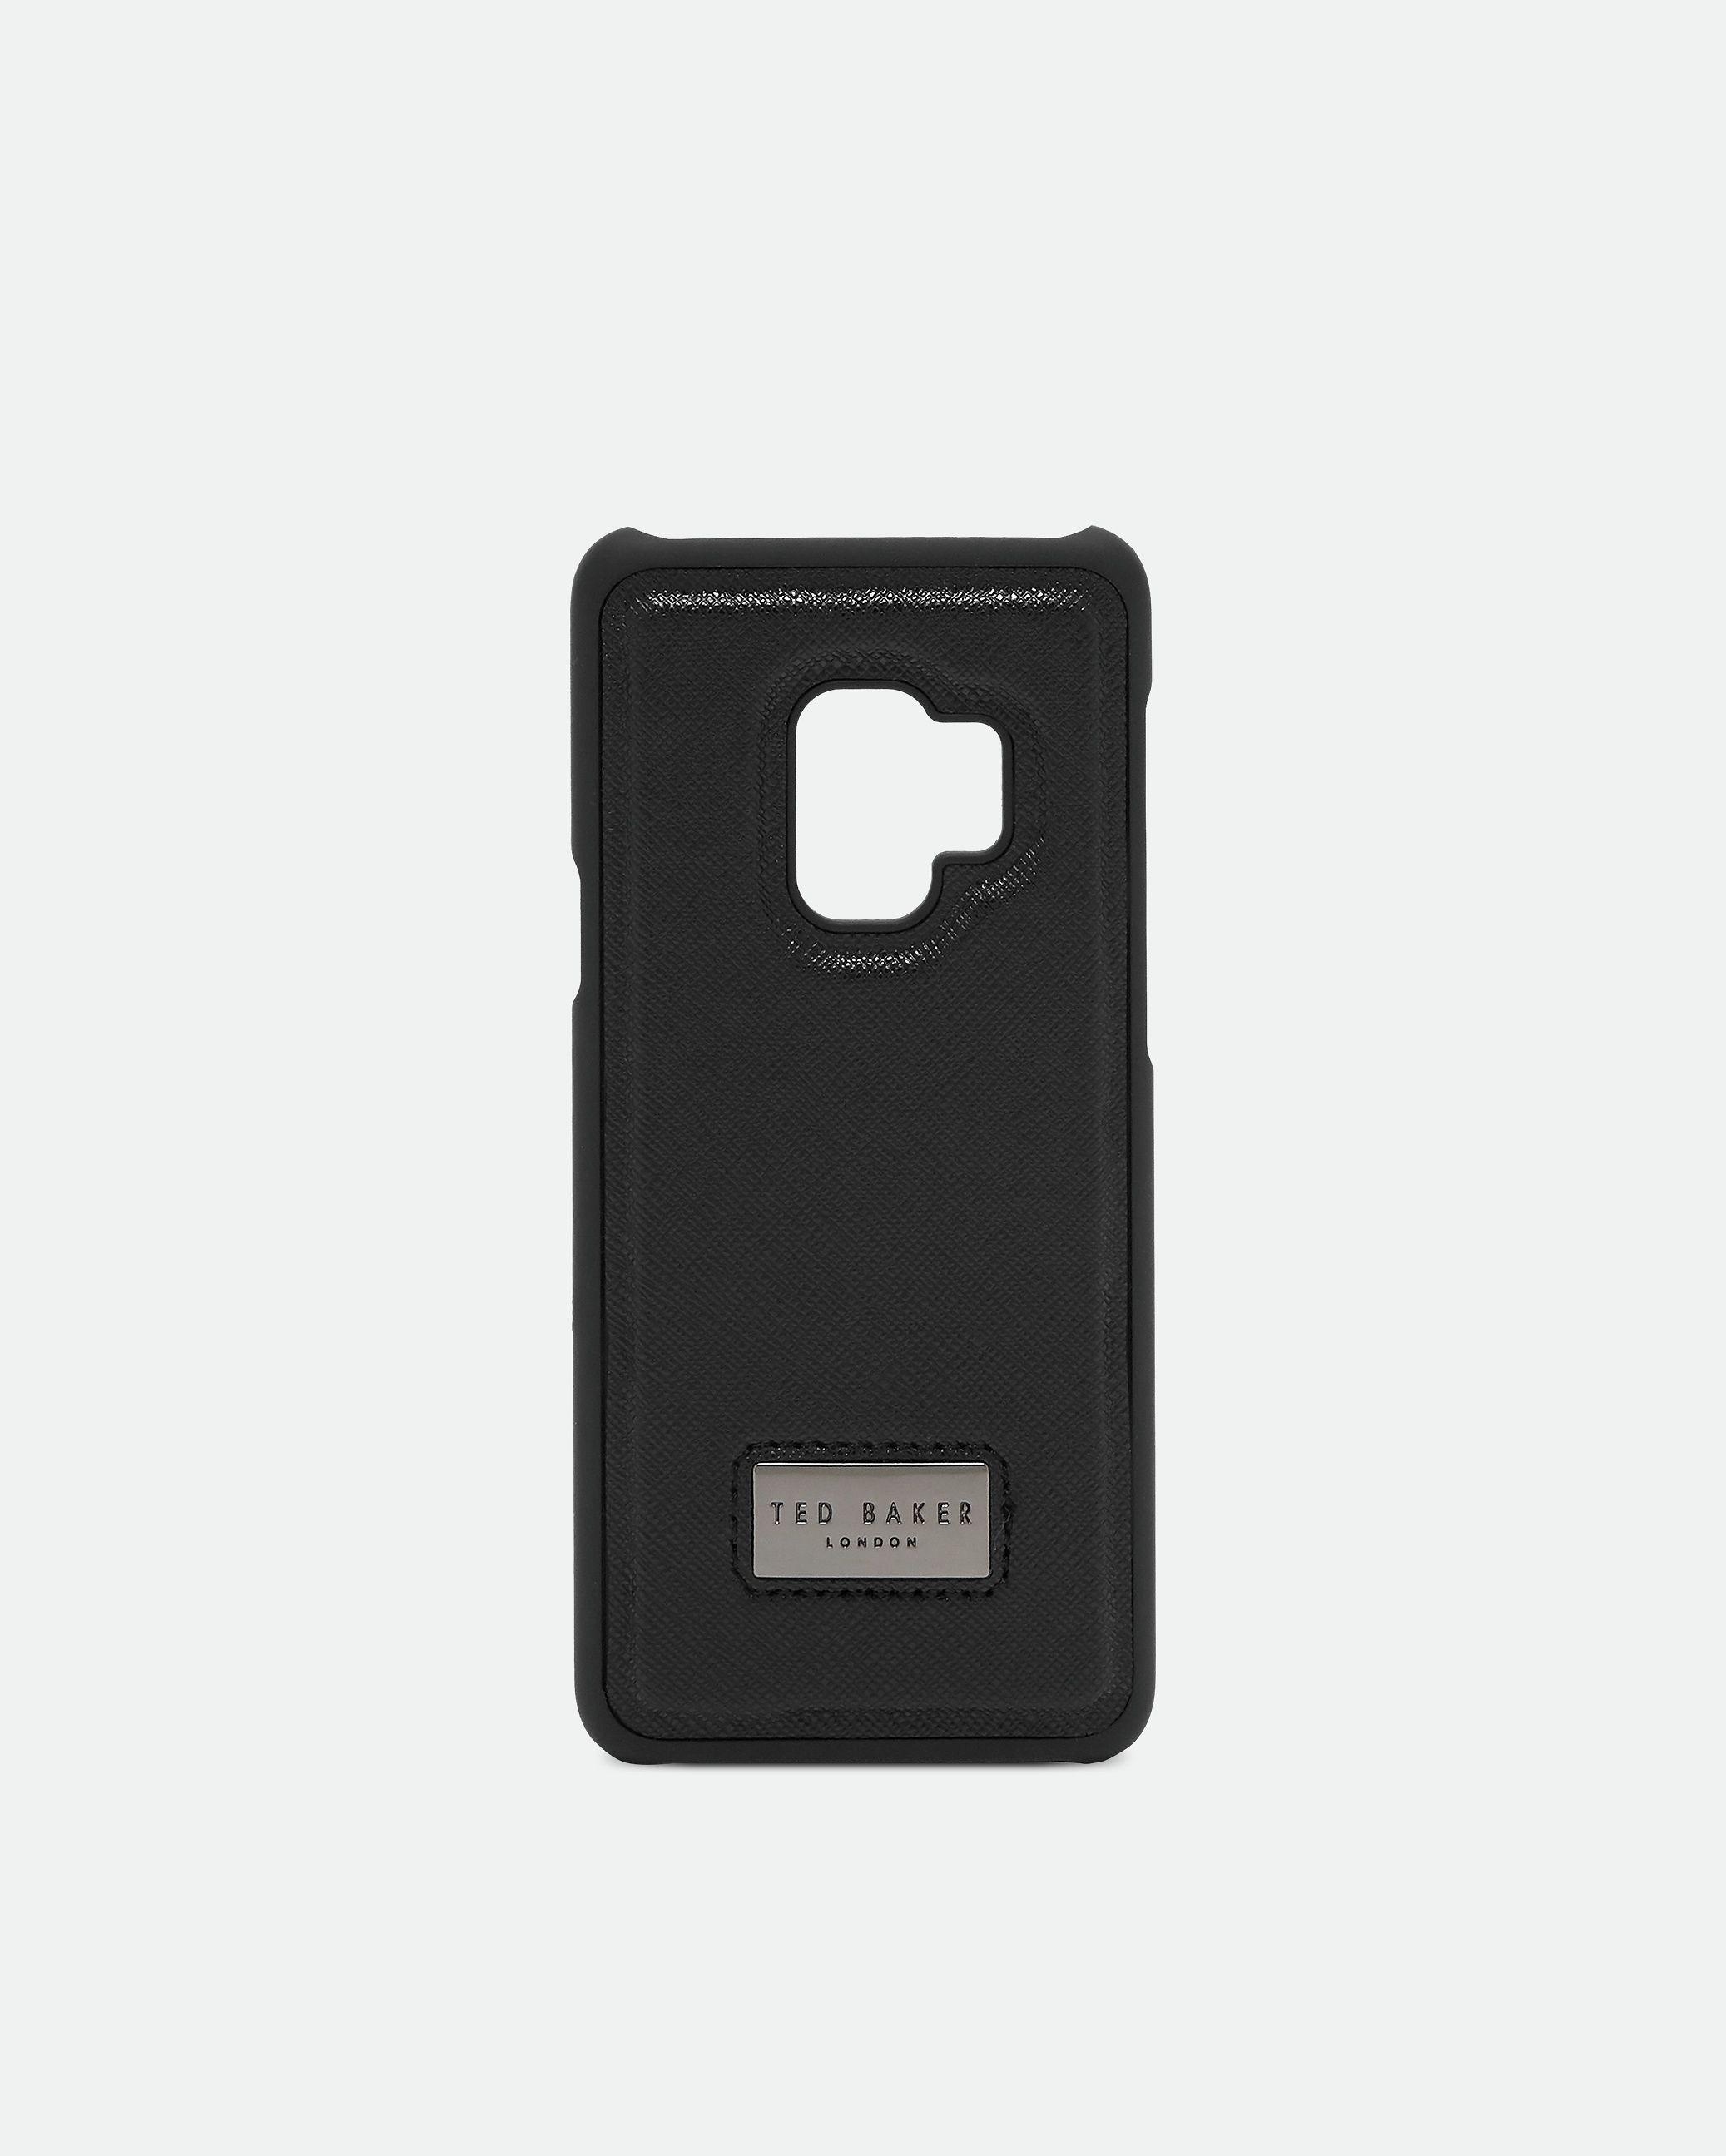 Ted Baker Carrow Samsung Galaxy S9 Clip On Case, Black